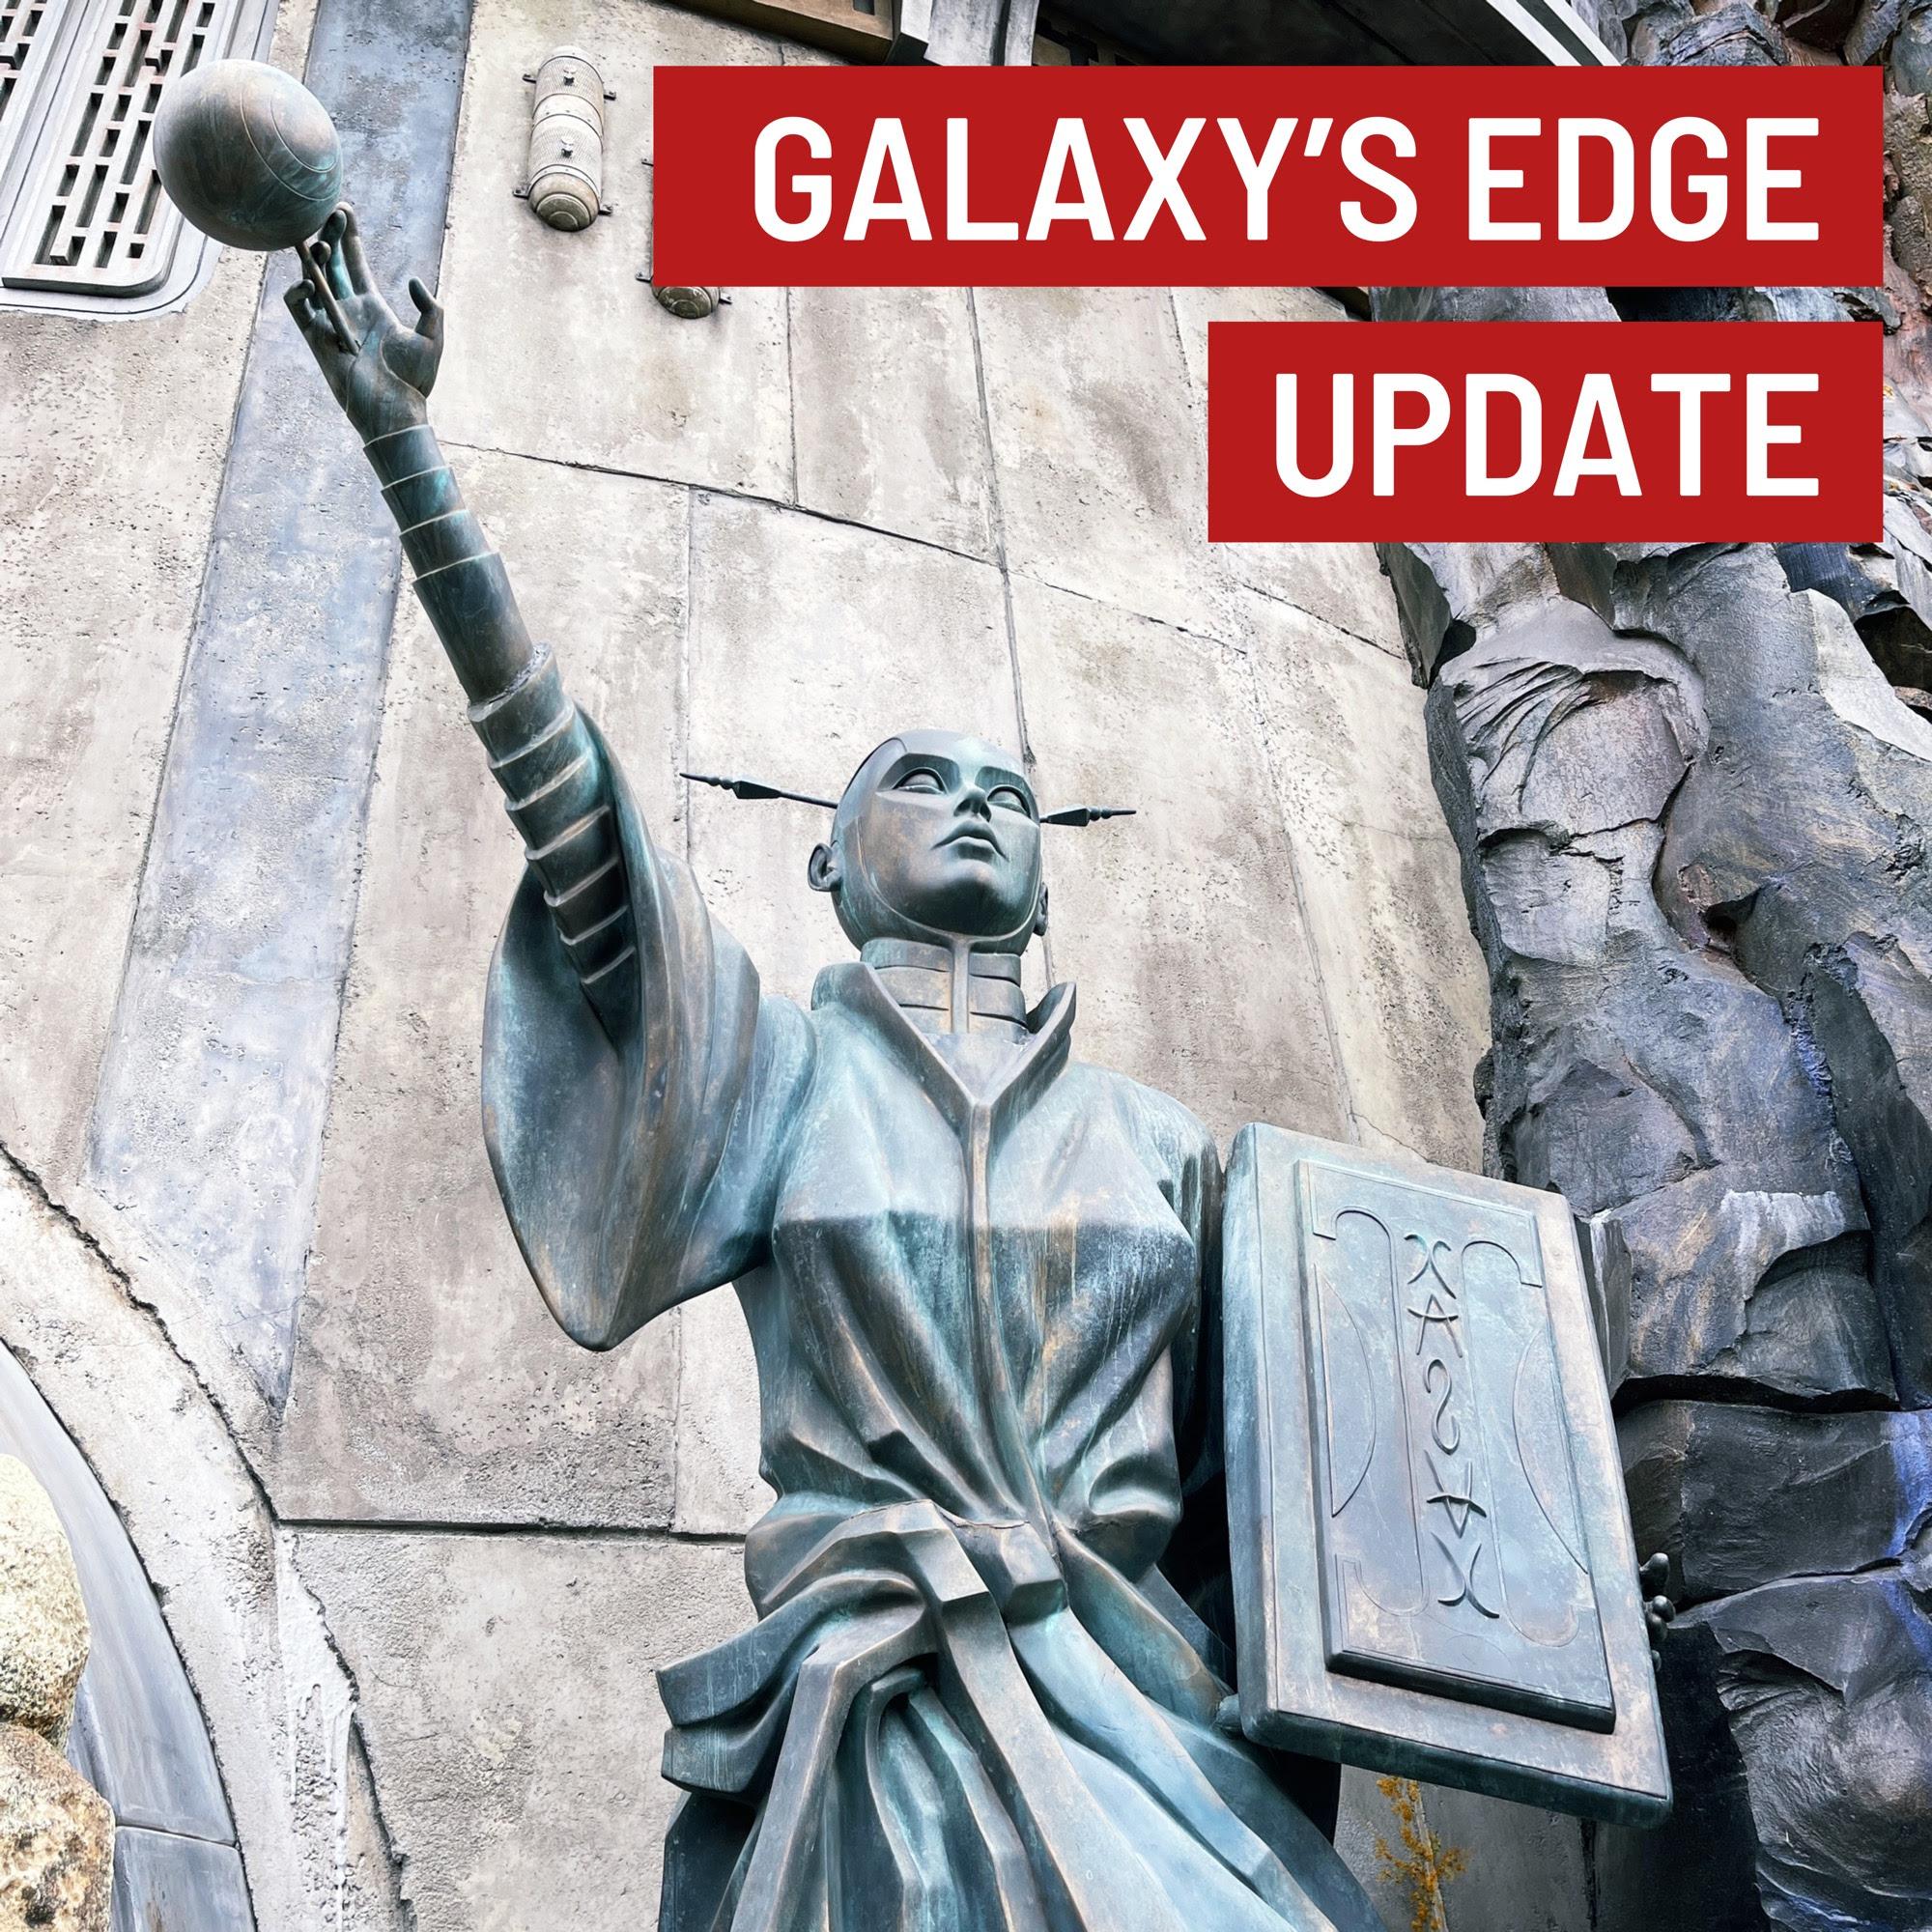 Star Wars: Galaxy's Edge Update - Legacy Lightsaber Price Increase, Stock & Cal Kestis